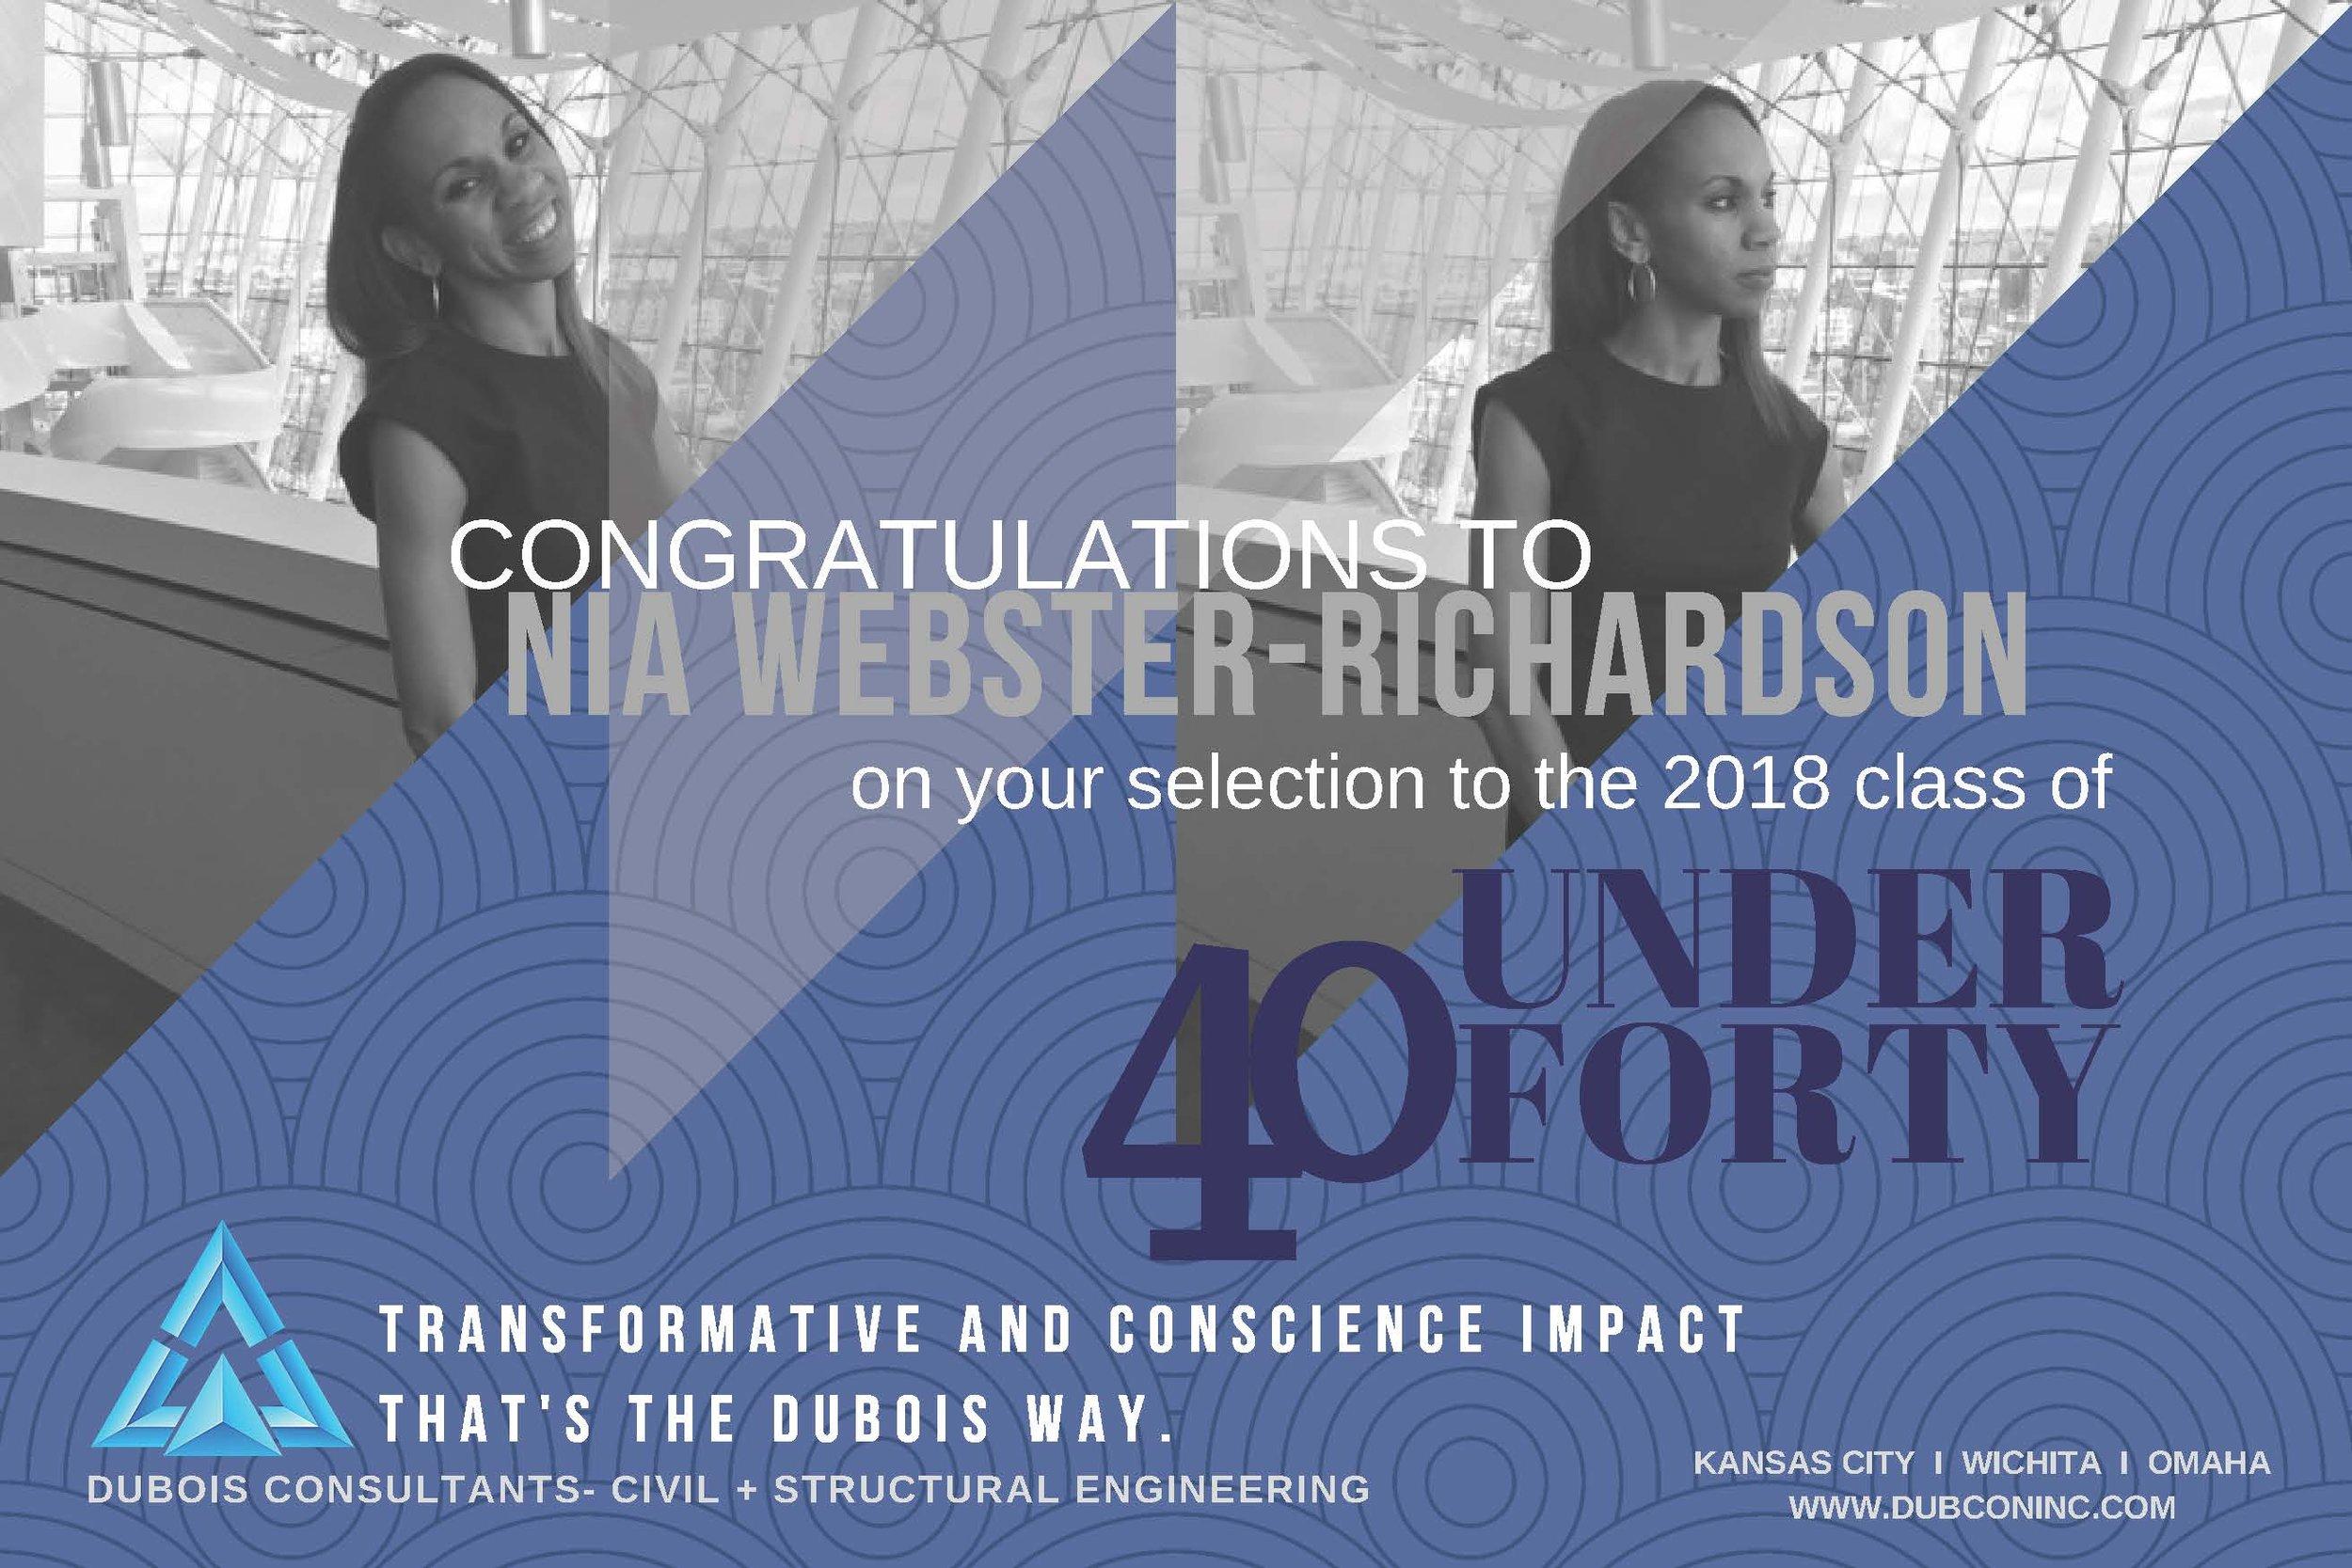 Ingrams 40 Under 40 Congrats AD-Nia Webster Richardson-DuBois Consultants.jpg